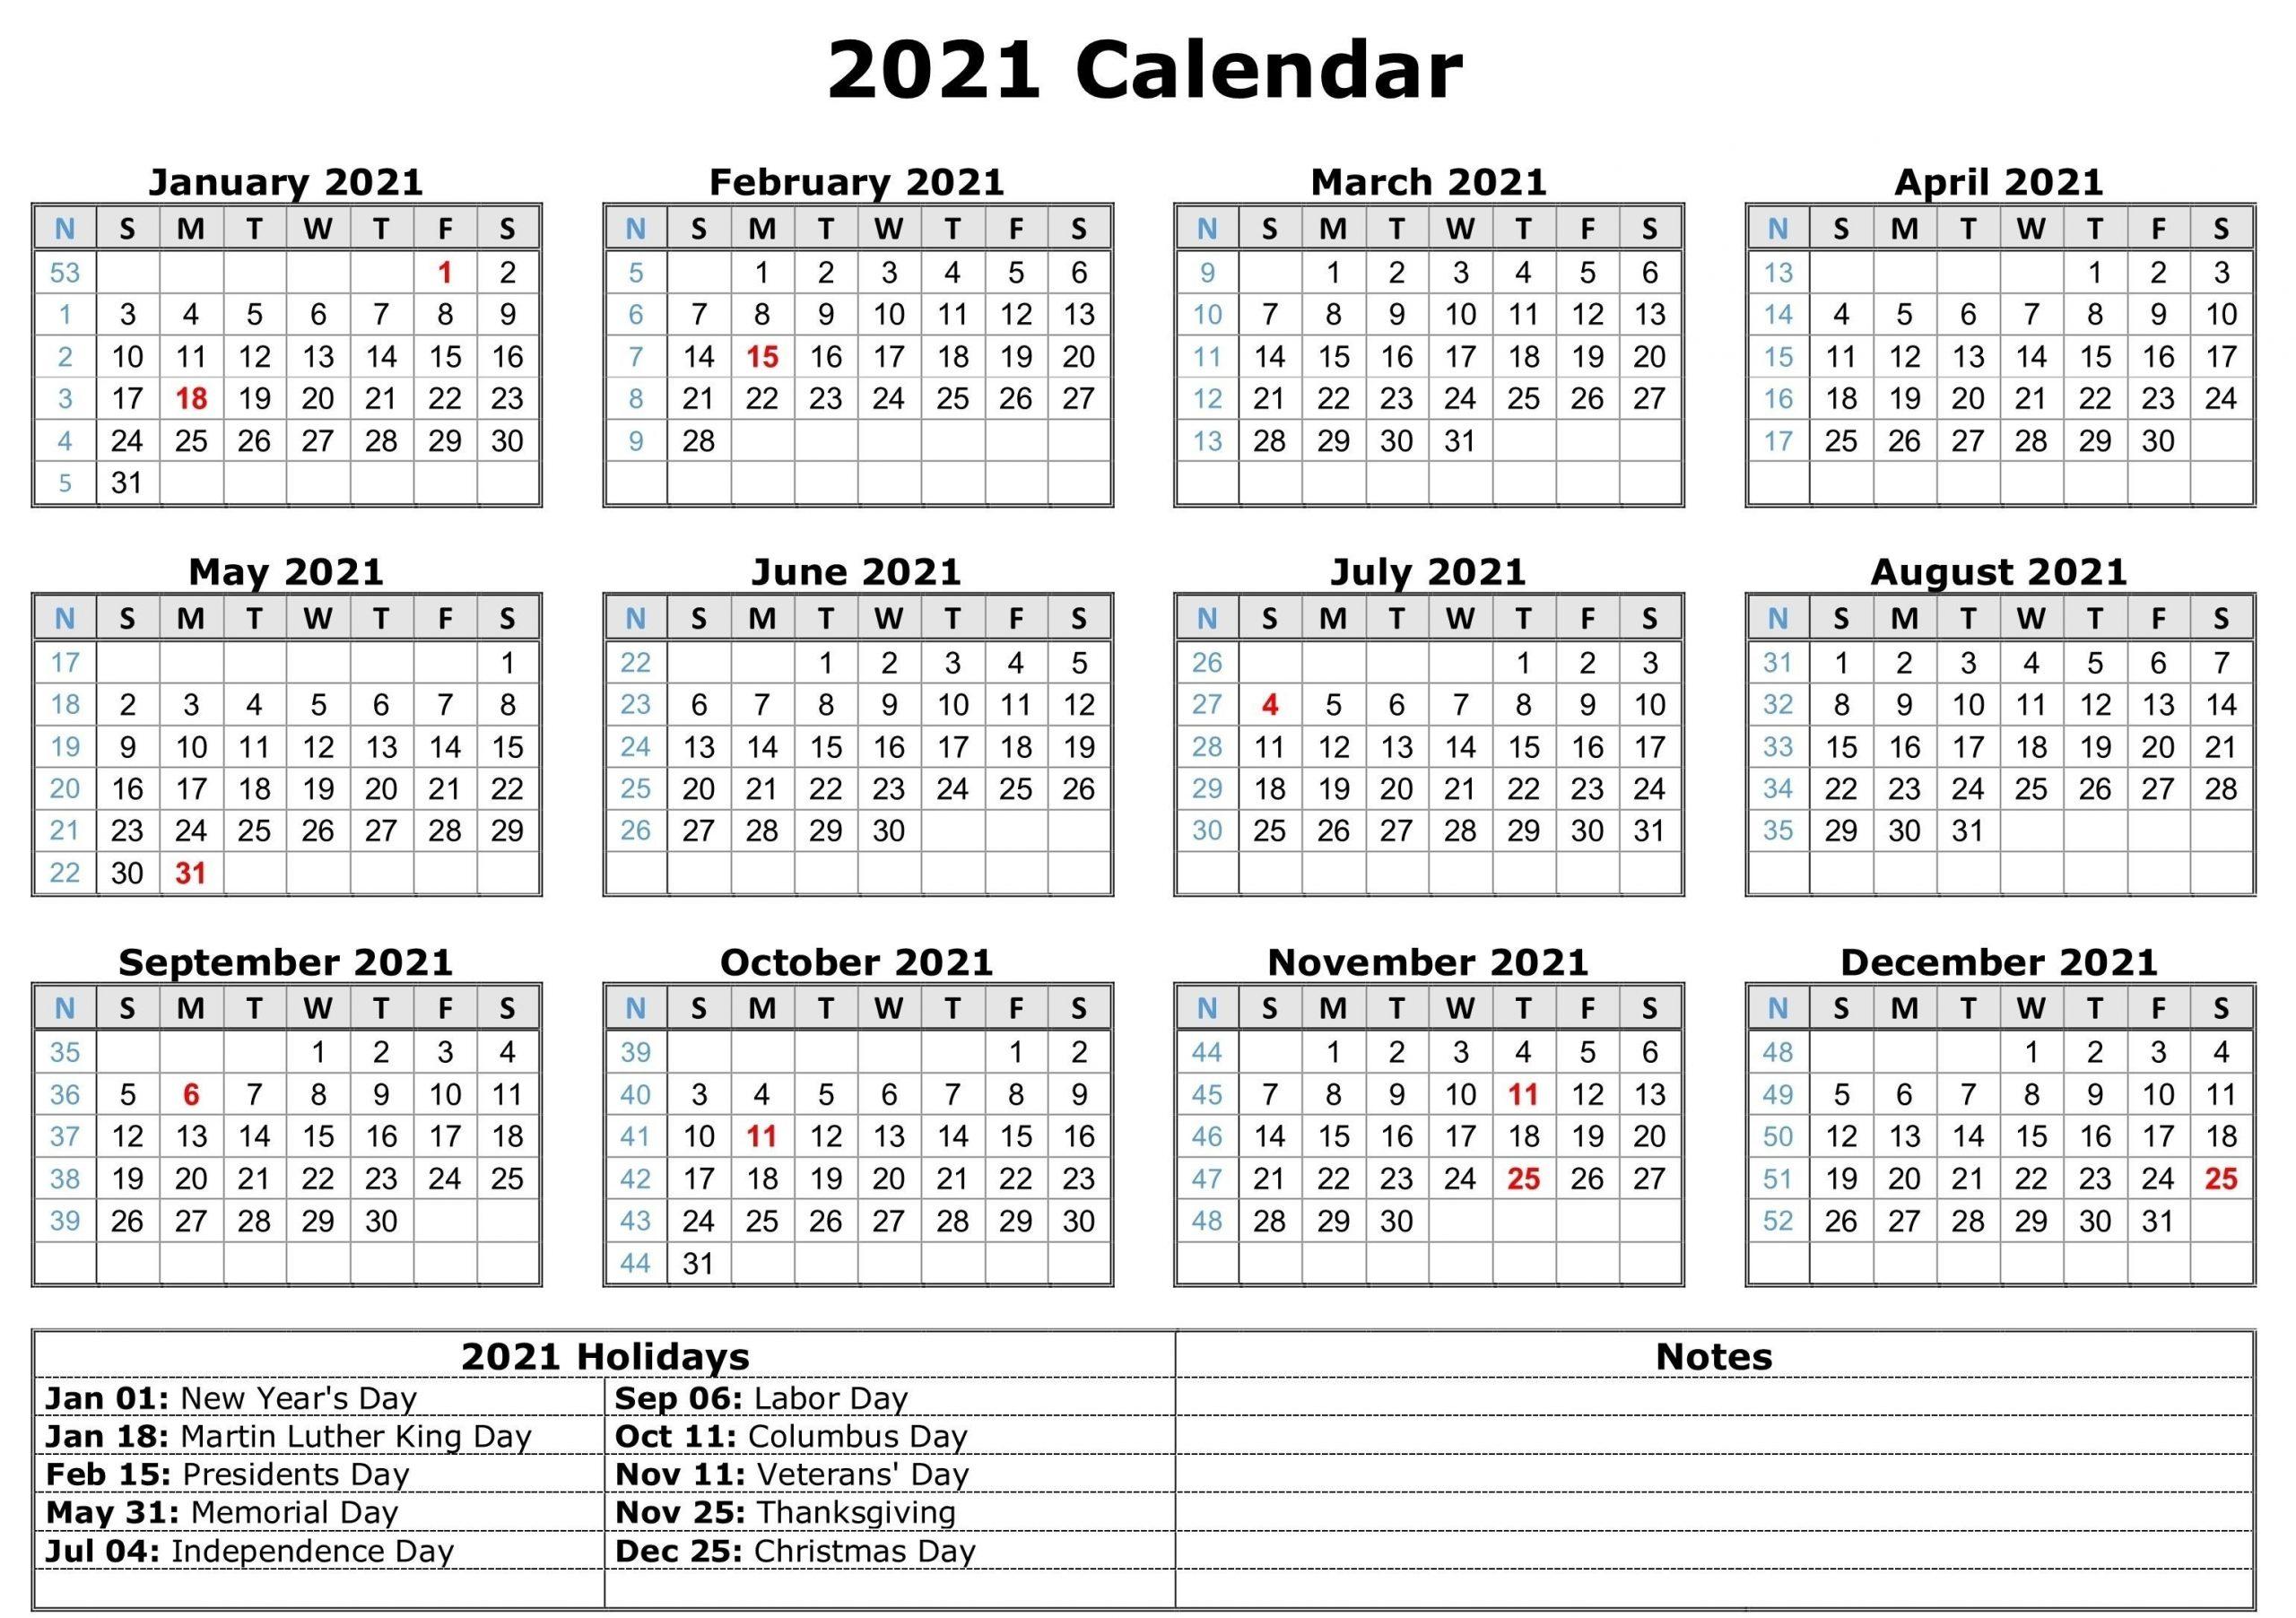 Print Pocket 2021 Calendar Free - Template Calendar Design for Free Printable 2021 Calendar Templates Word Photo